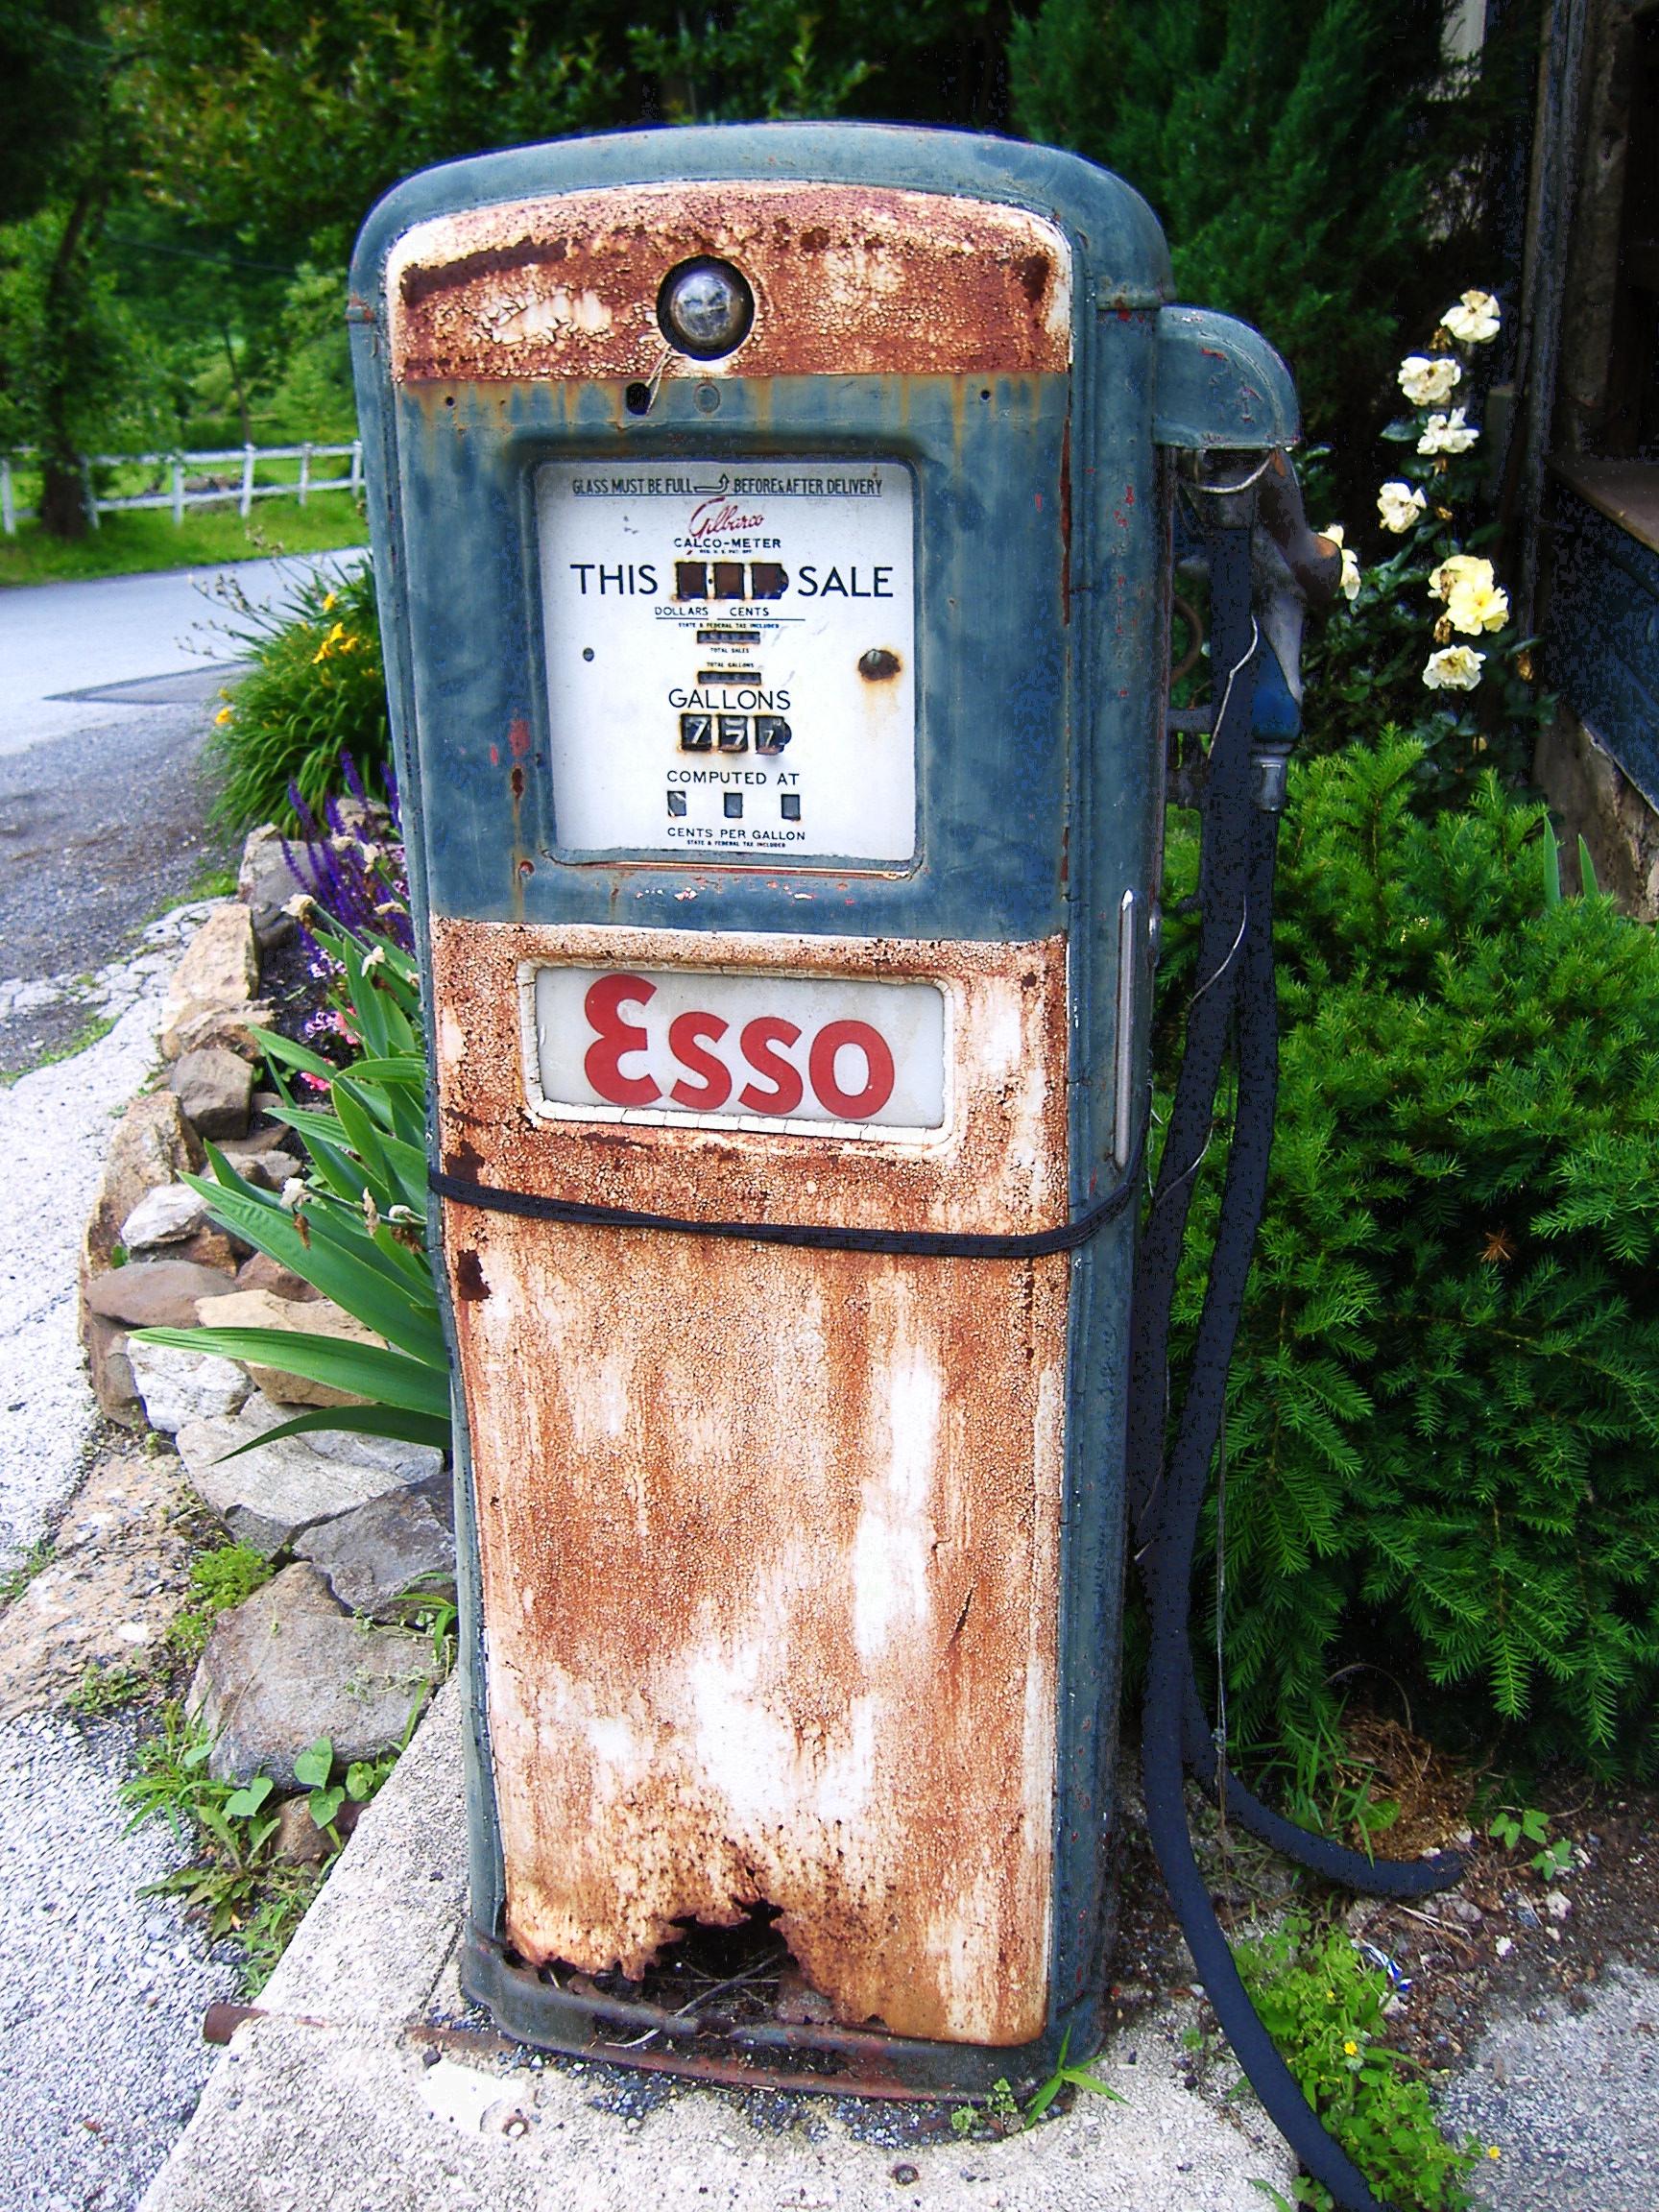 Esso gasoline pump - Birchrunville Store Cafe - 1403 Hollow Road, Birchrunville, Pennsylvania U.S.A. - May 28, 2010